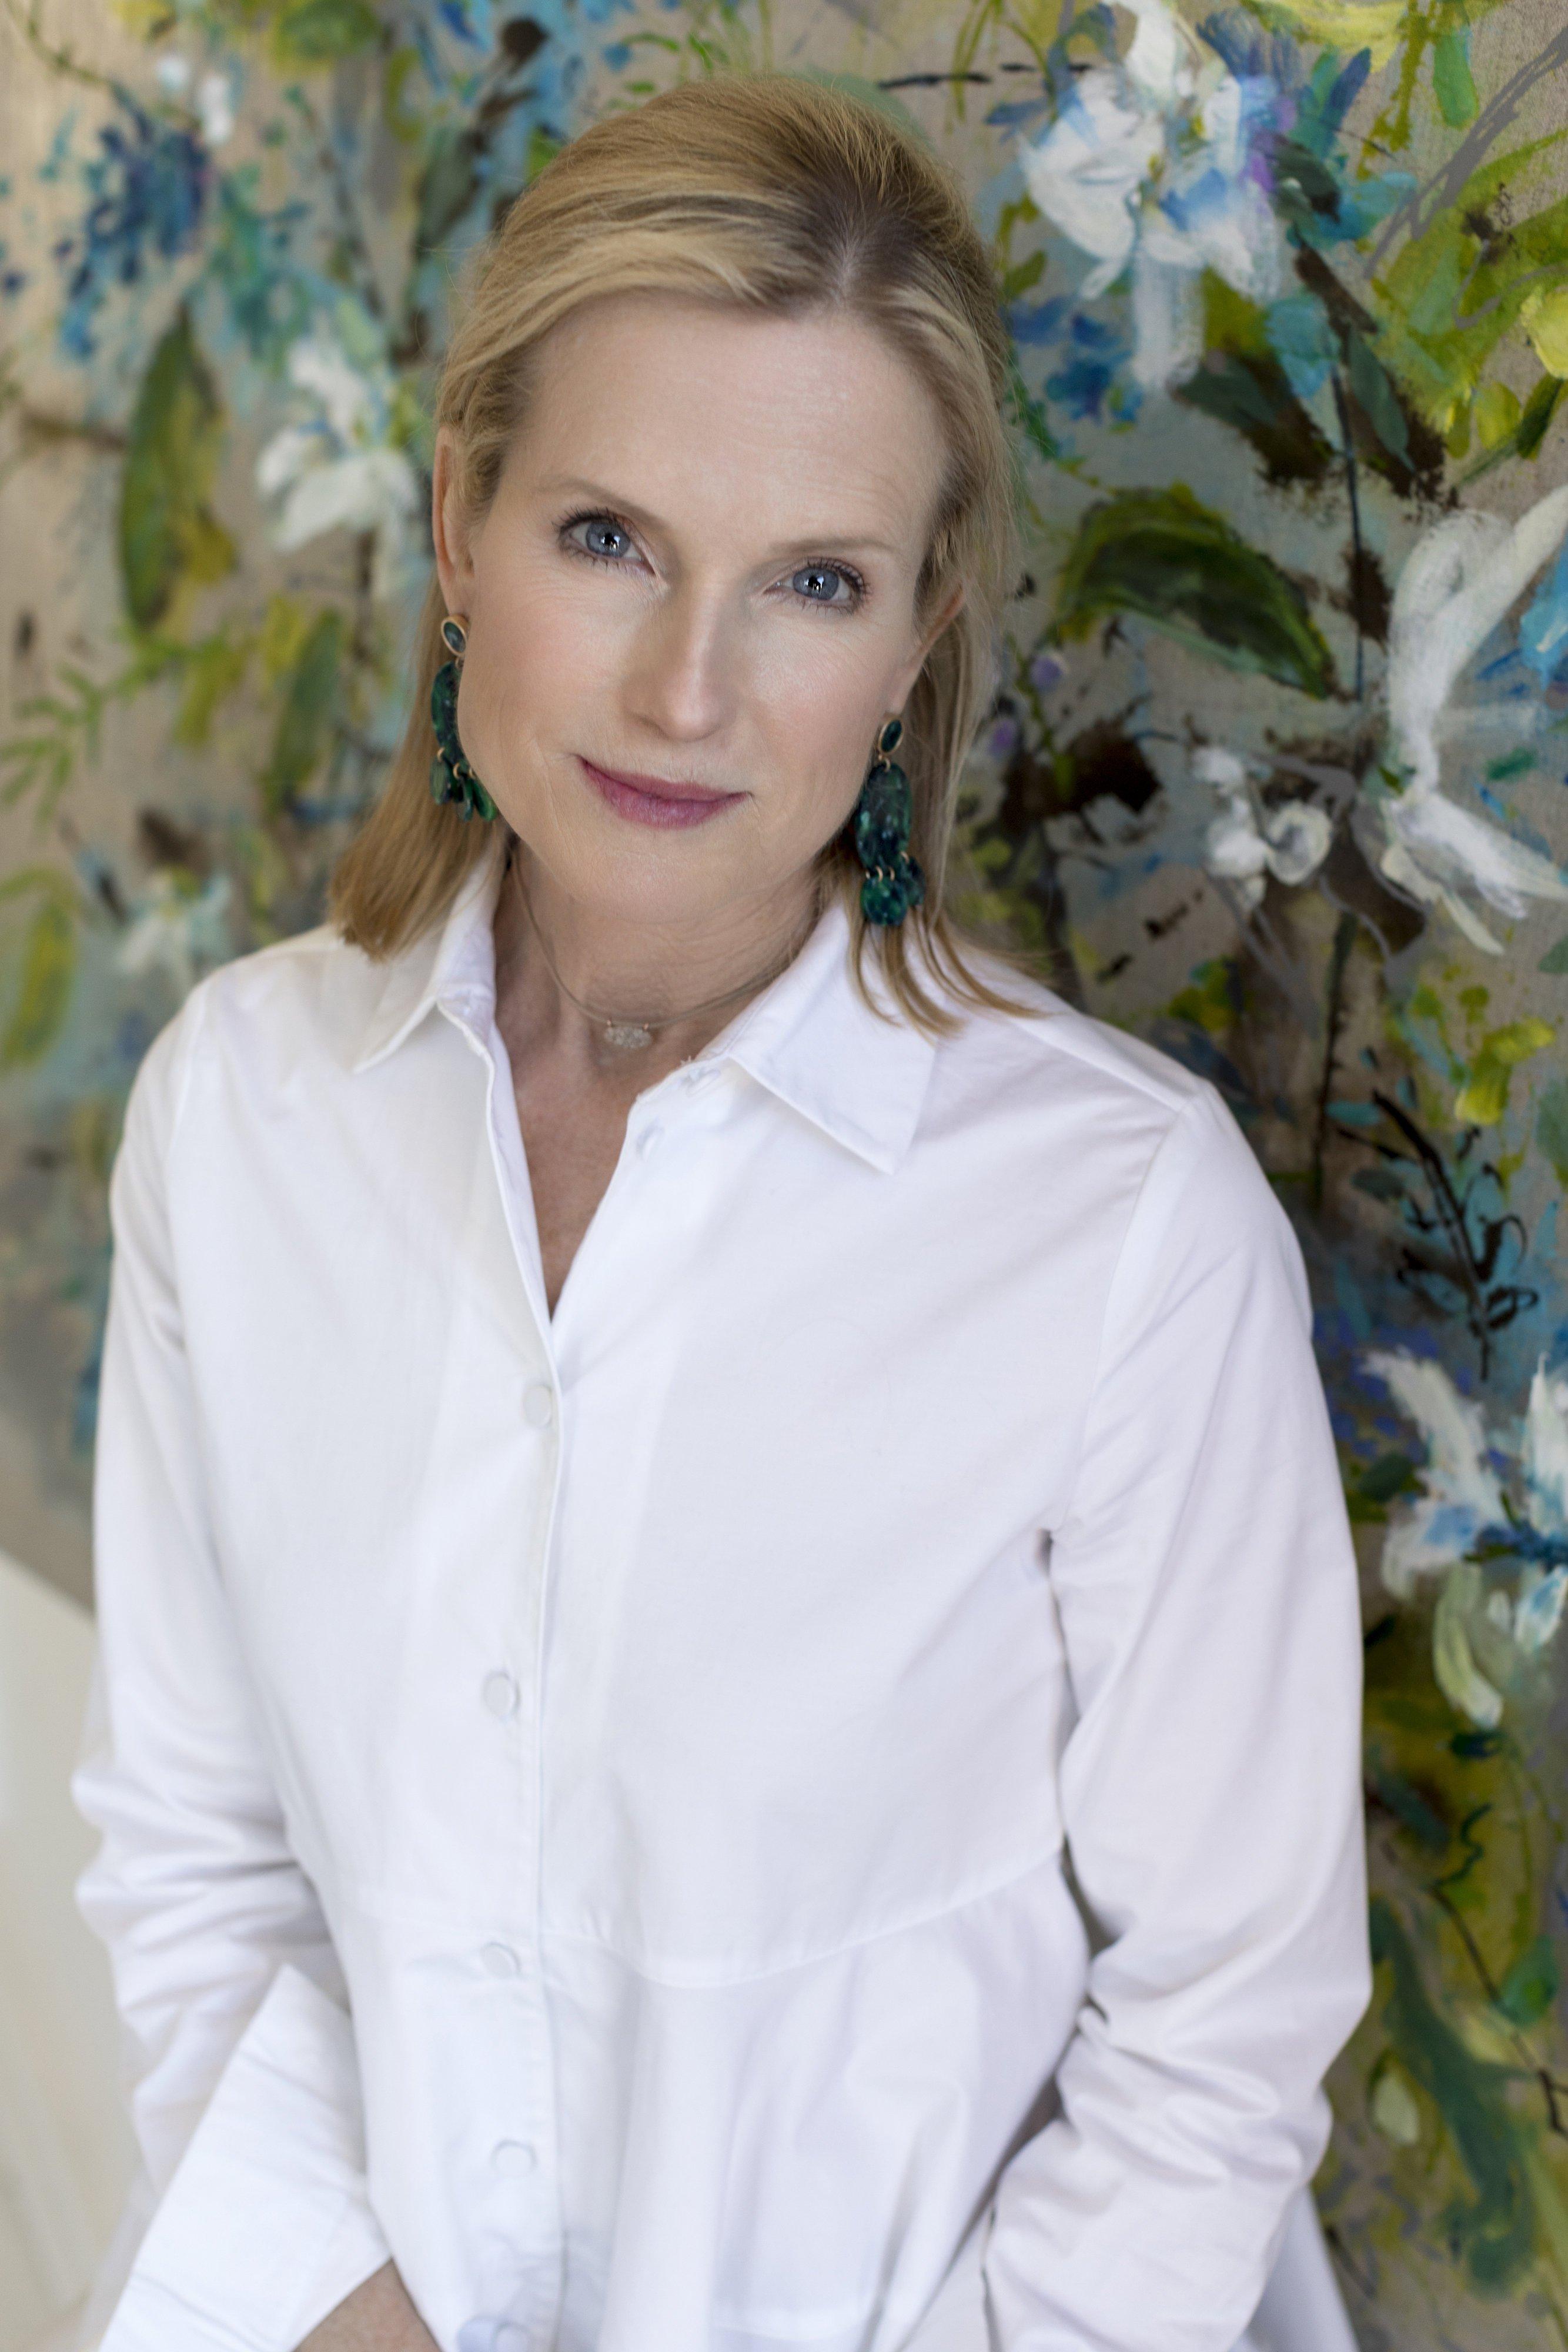 JANIE PINNEY | ARTIST IN RESIDENCE